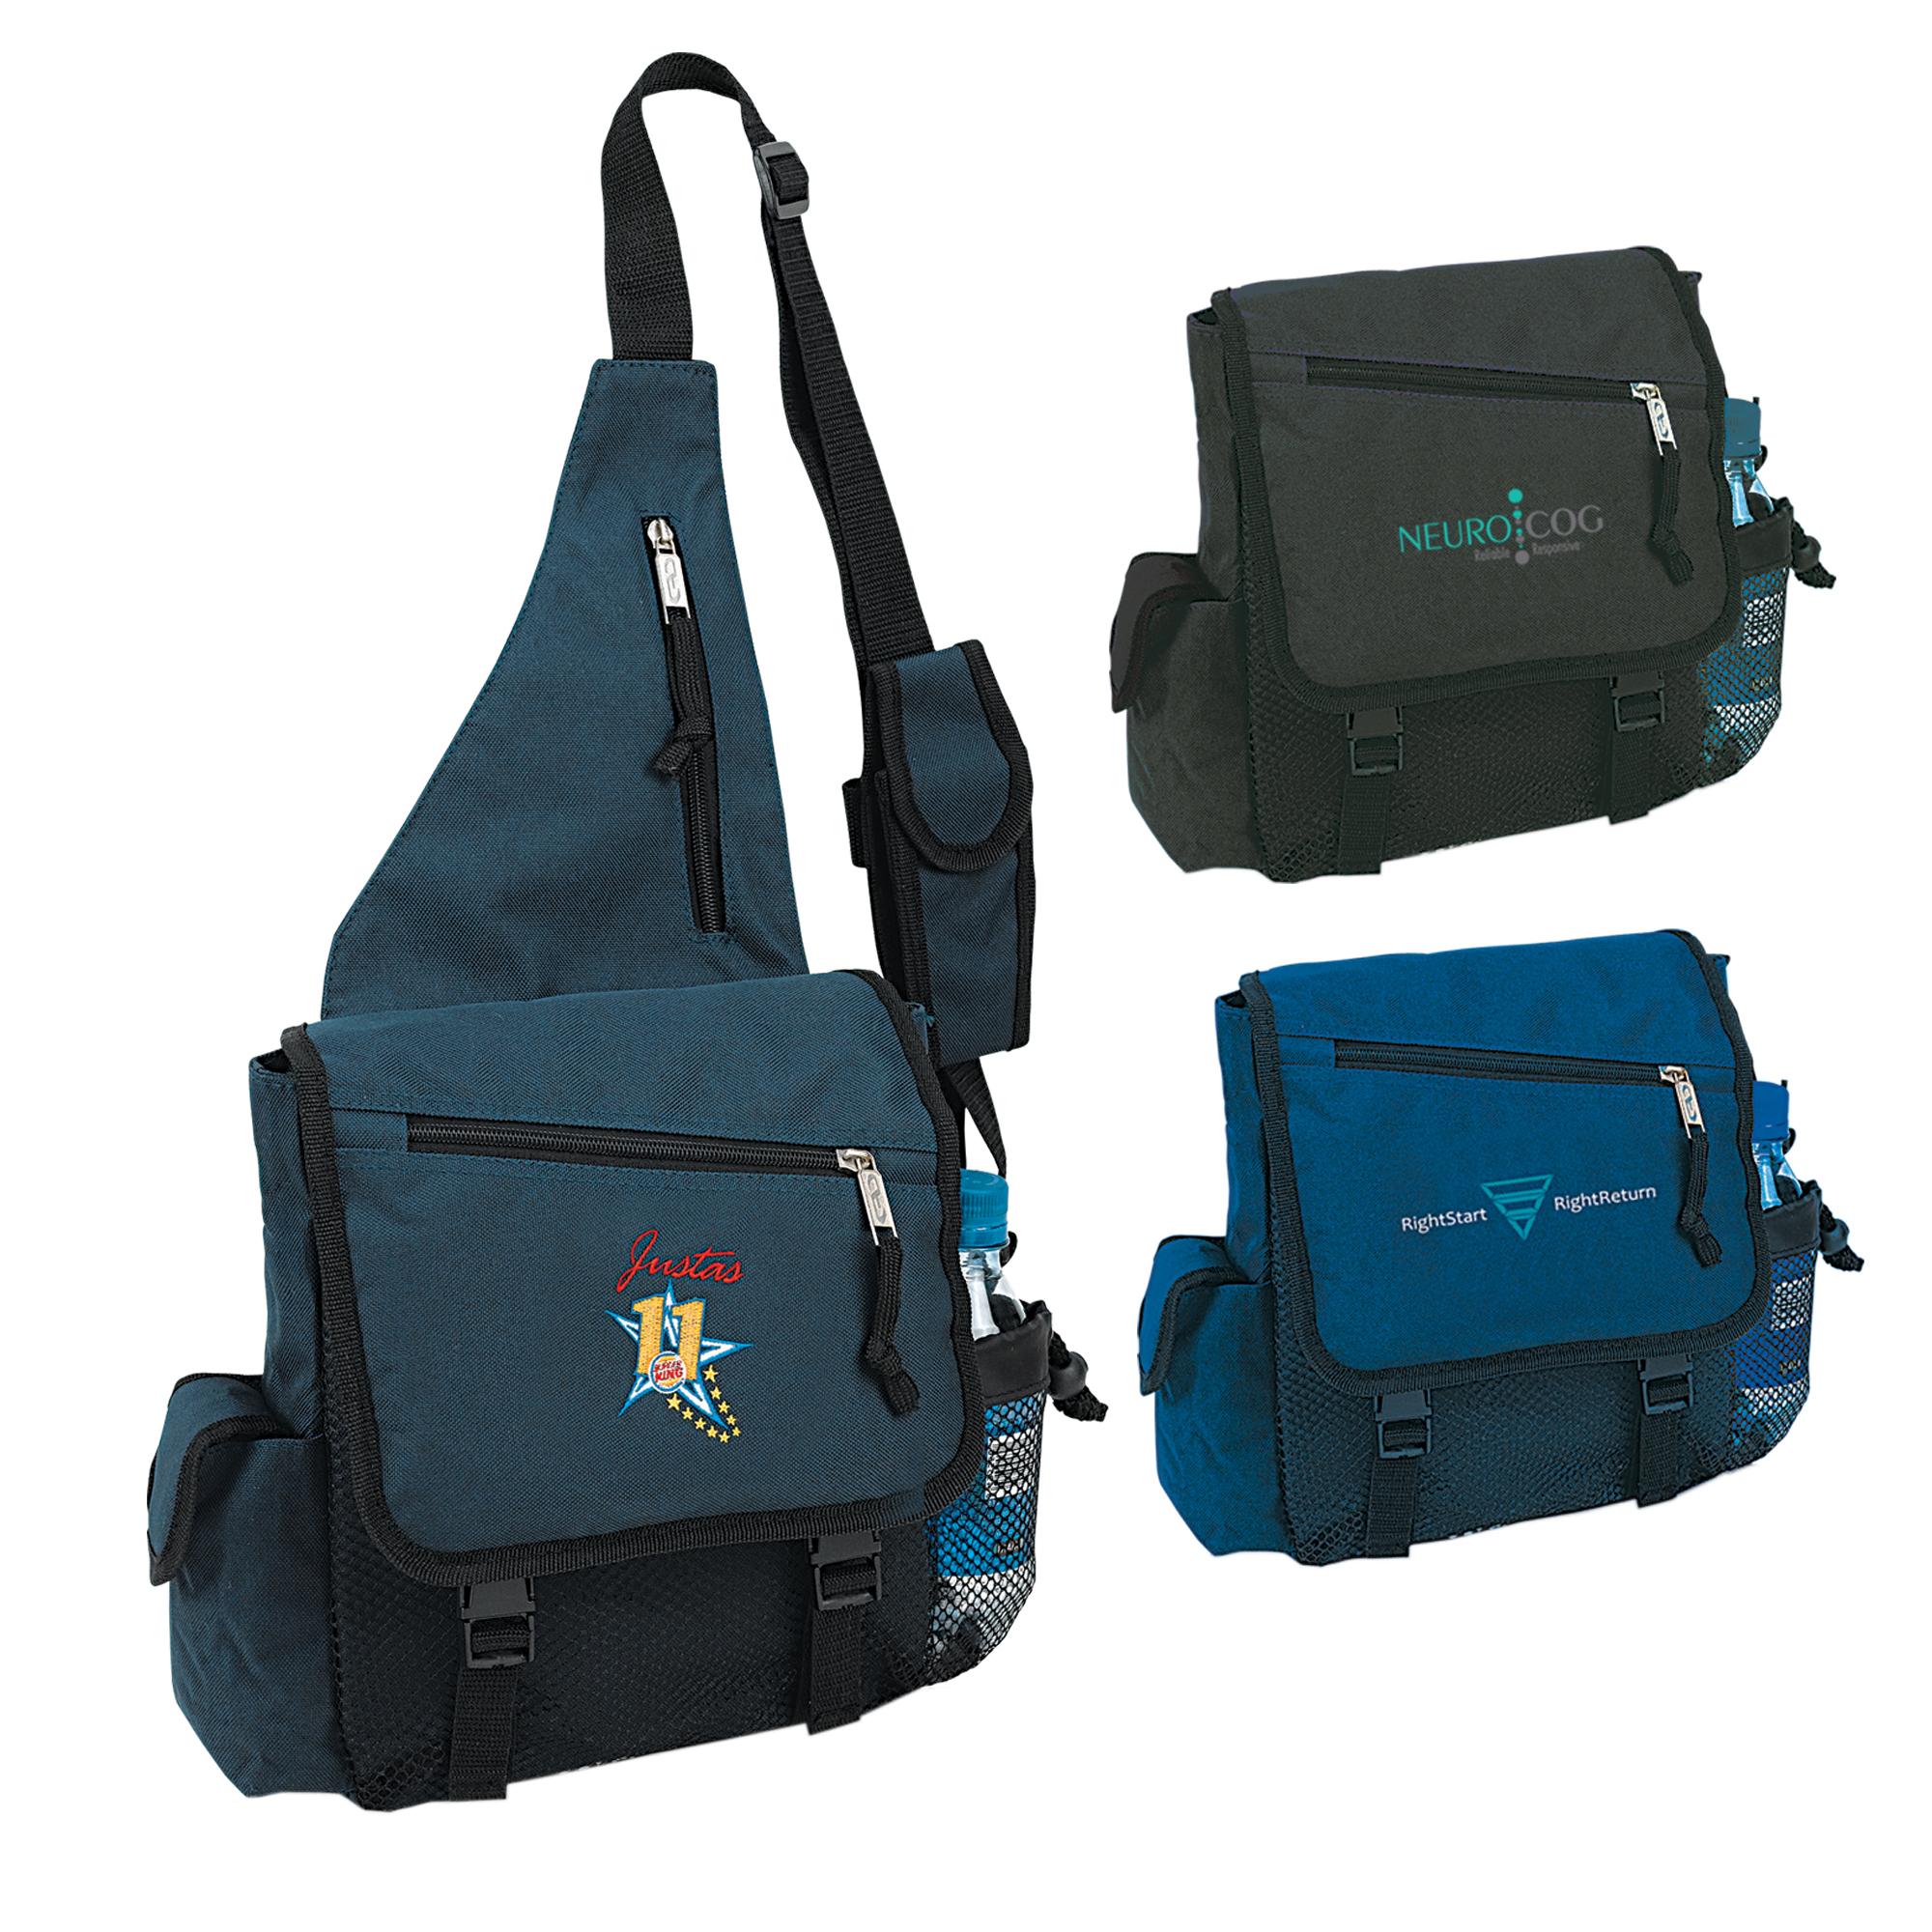 1407 Slingshot - Sling Bags - GROUP